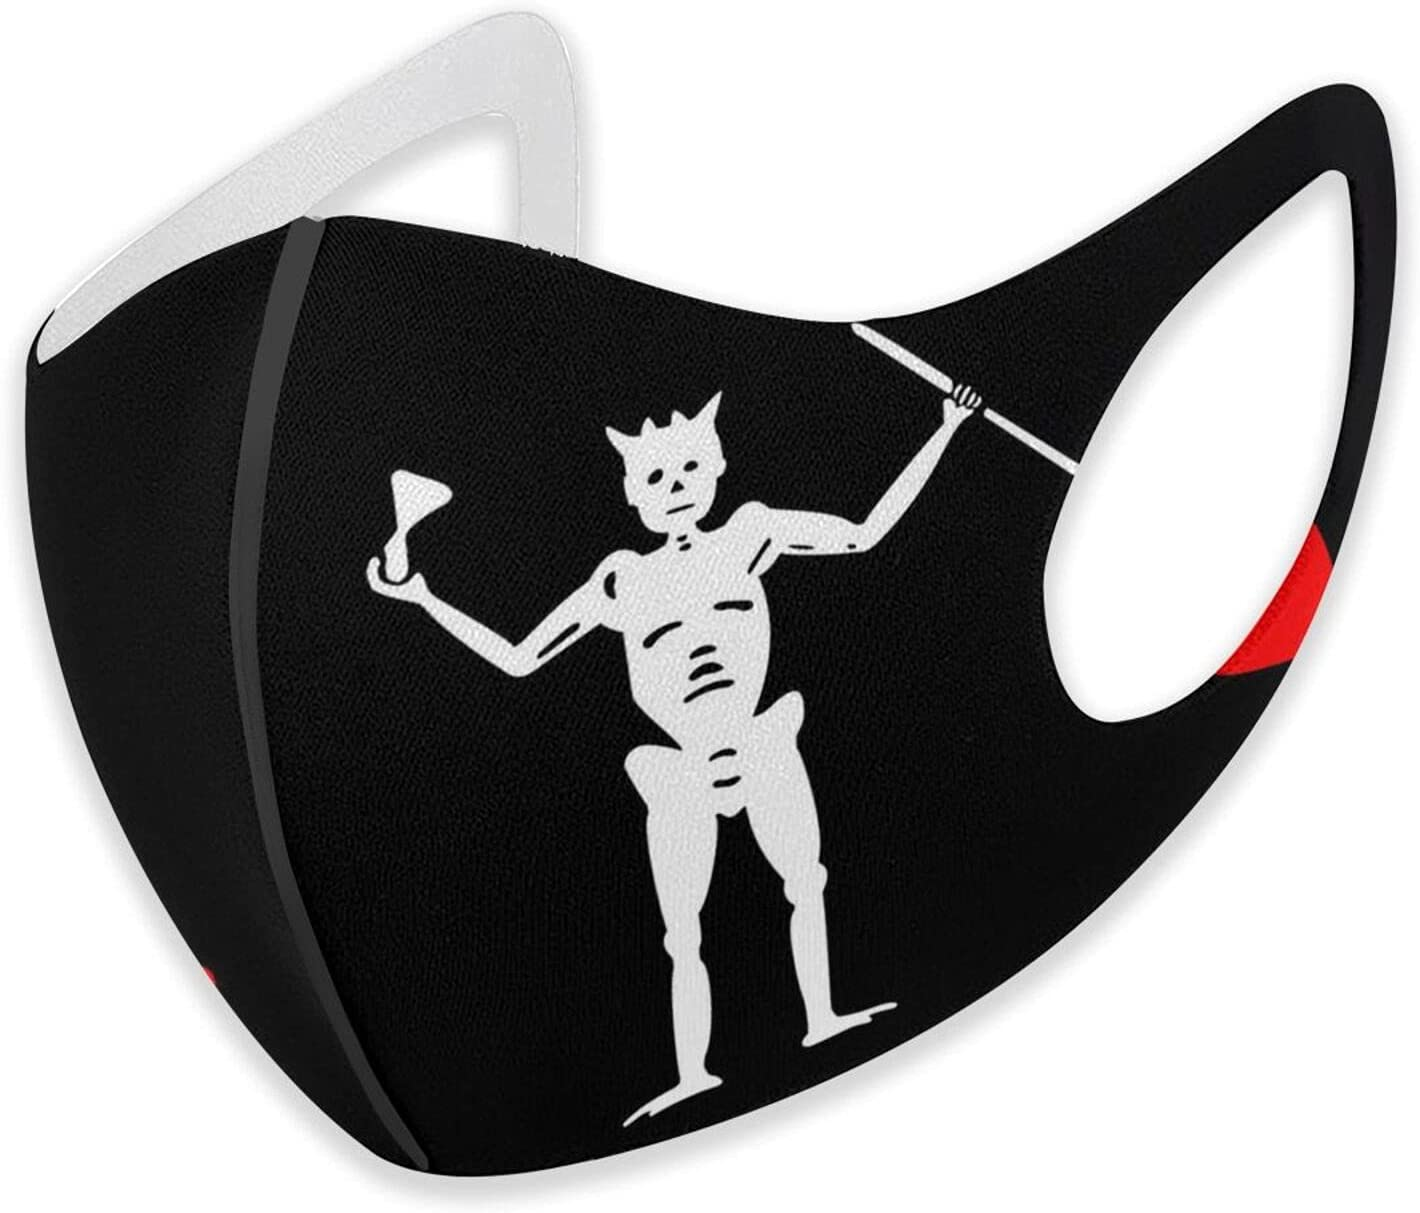 Face Tulsa Mall Mask Protect Cheap bargain Cover Bandana Unisex Scarf Reusable F Washable